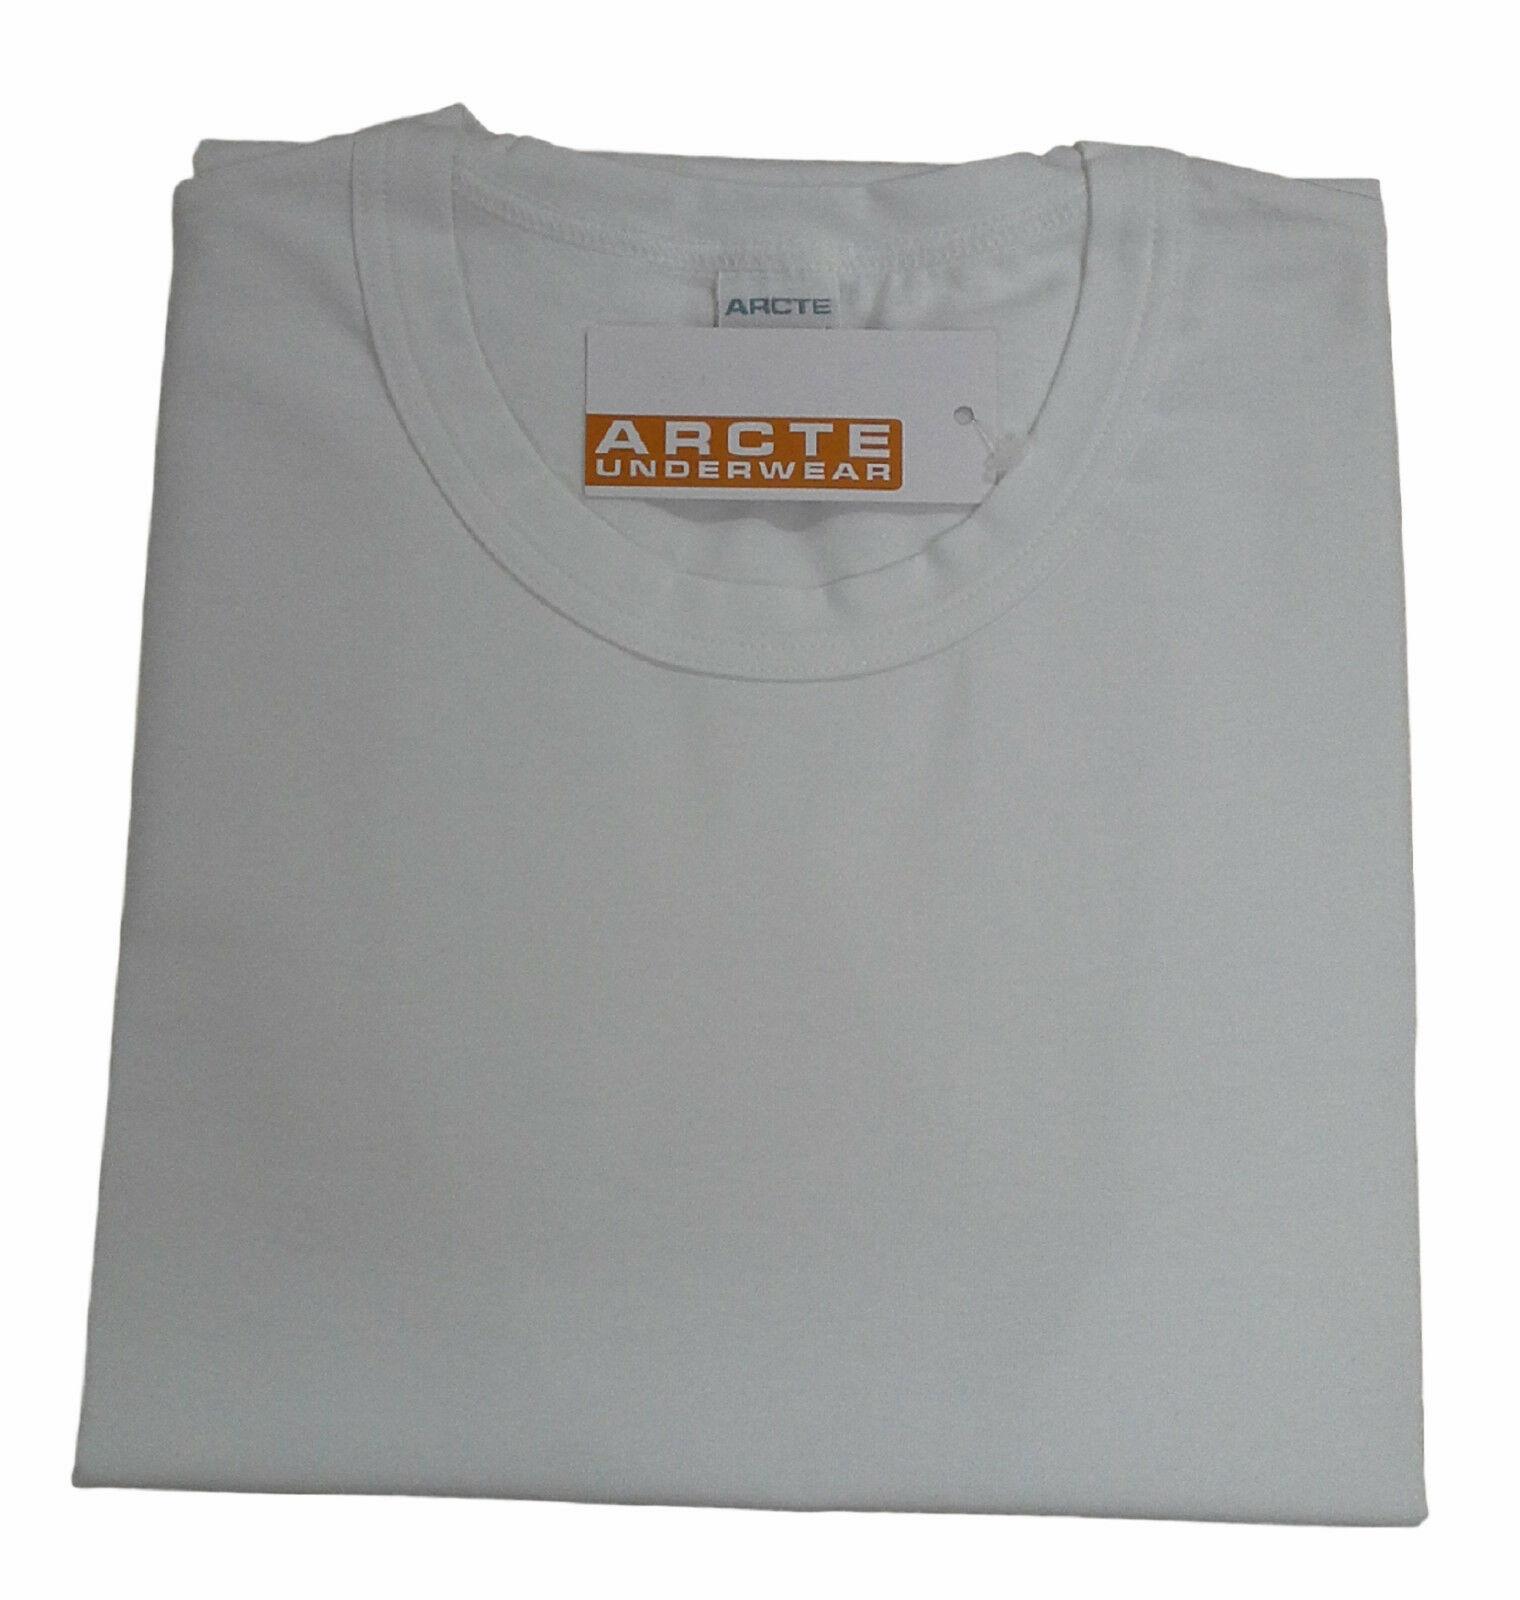 ARCTE - CARION. T-shirt - Mezza manica. Uomo, Intimo. Girocollo. 100% Cotone.